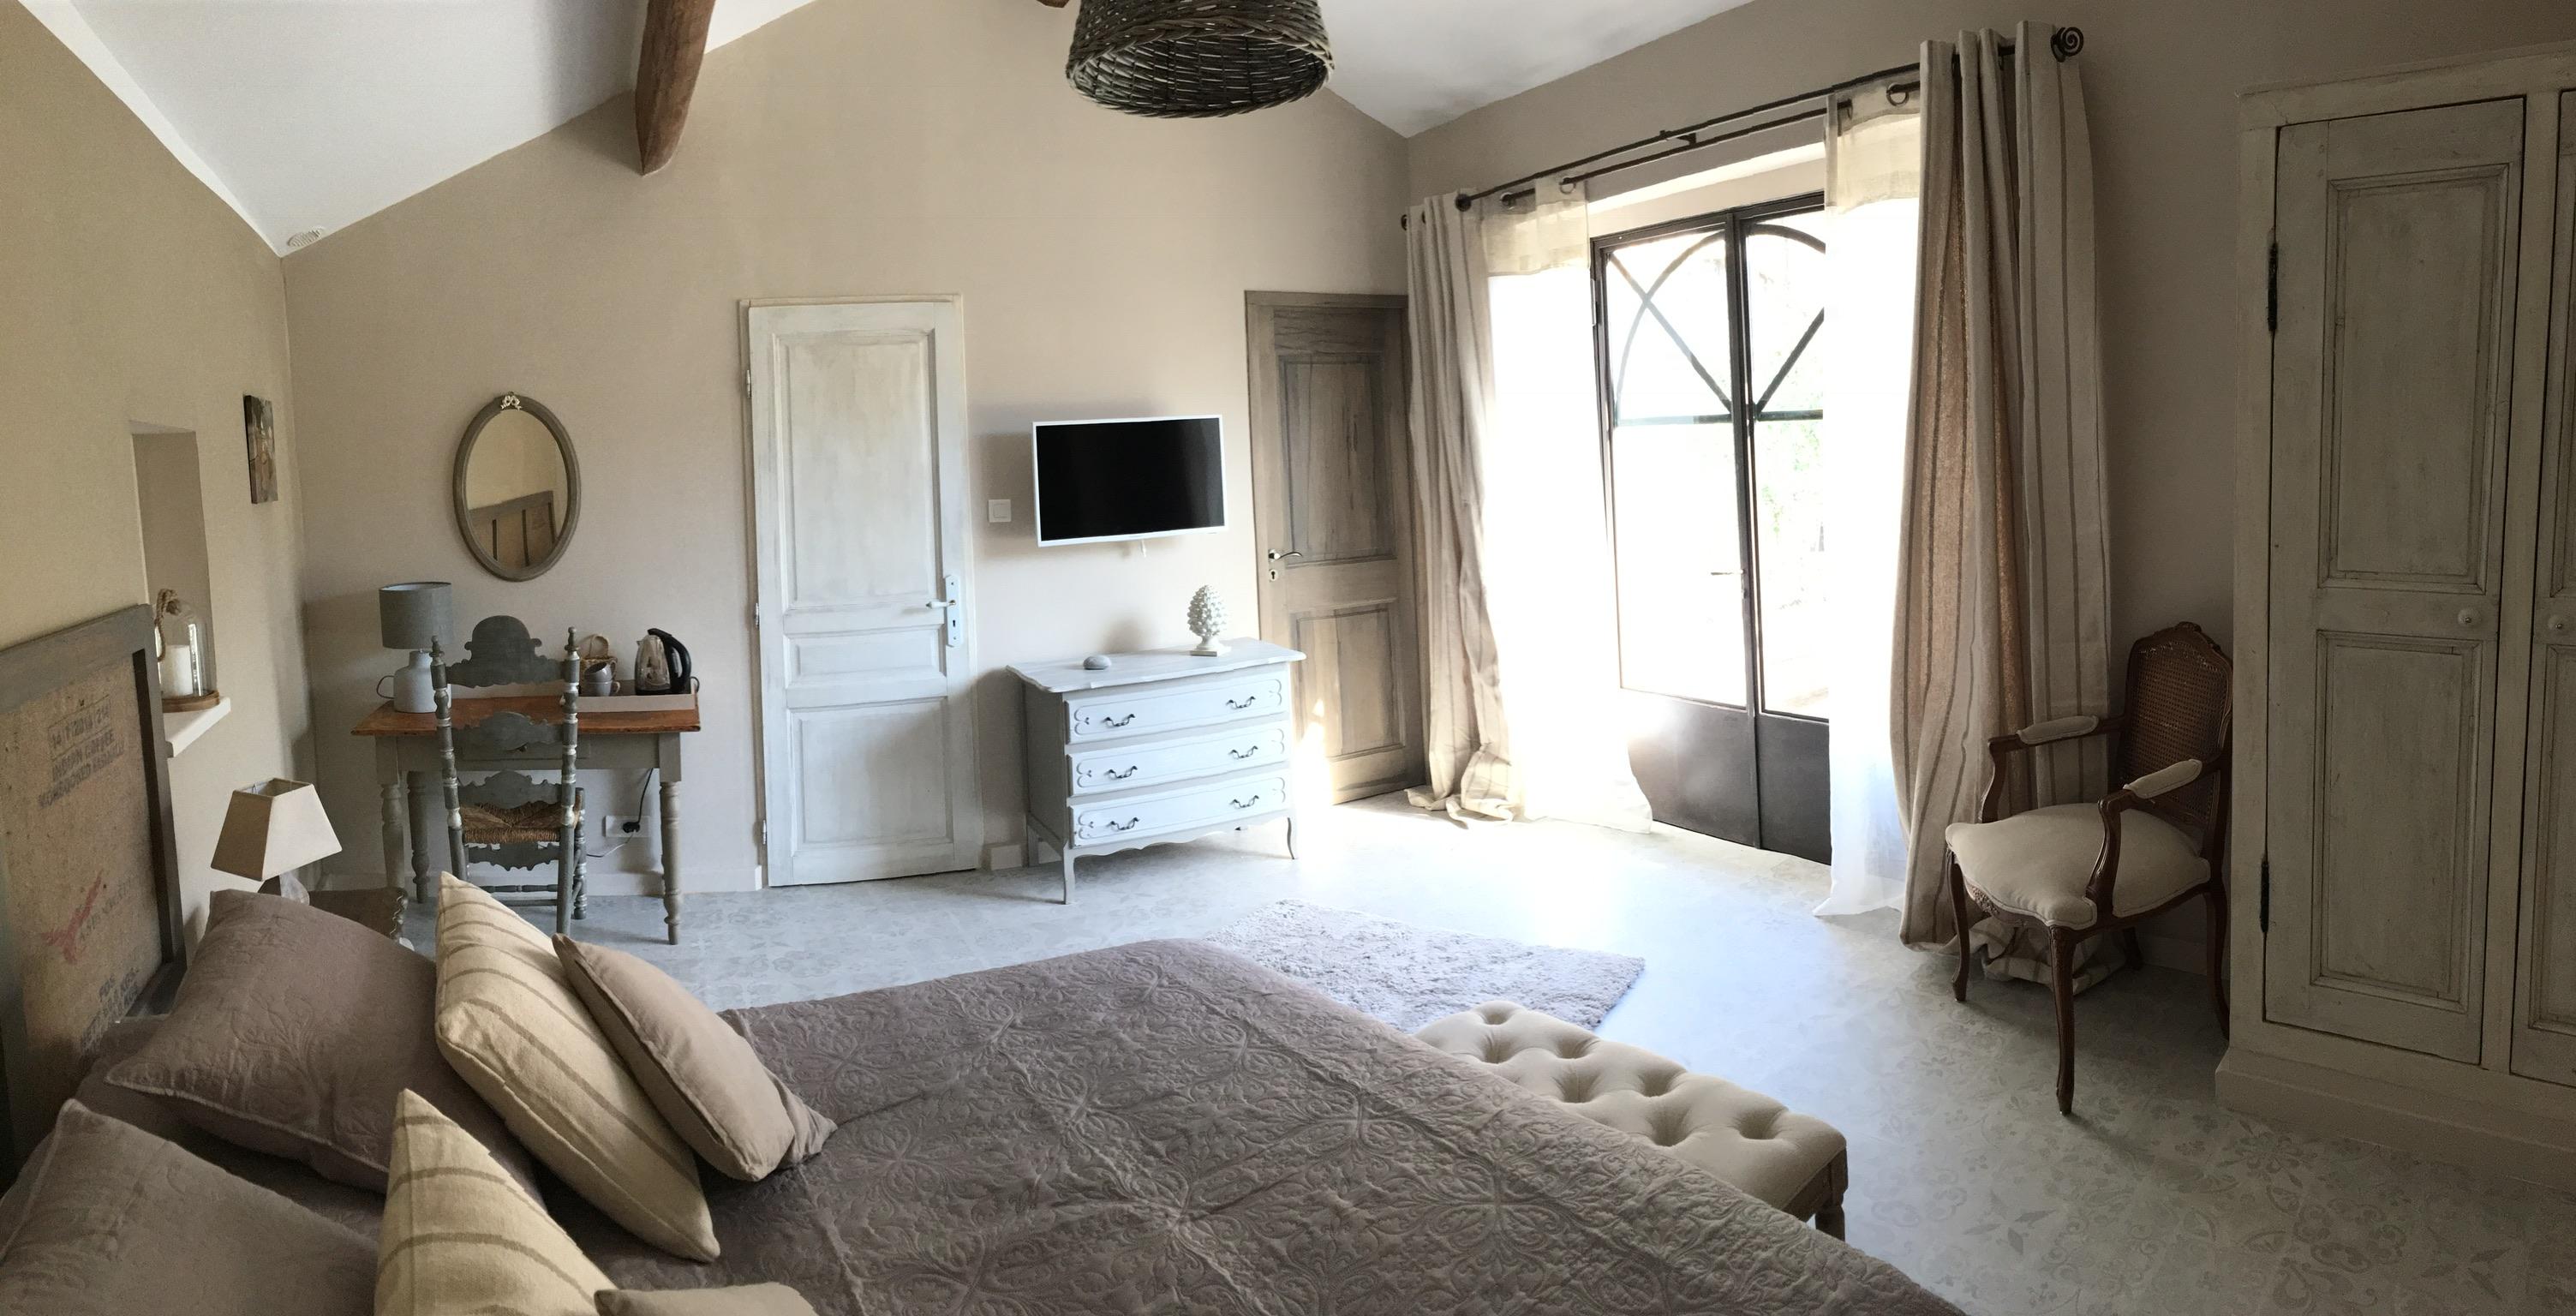 Burlap Room 3 - La Bastide des Songes - Luberon Bed and Breakfast - Vaucluse